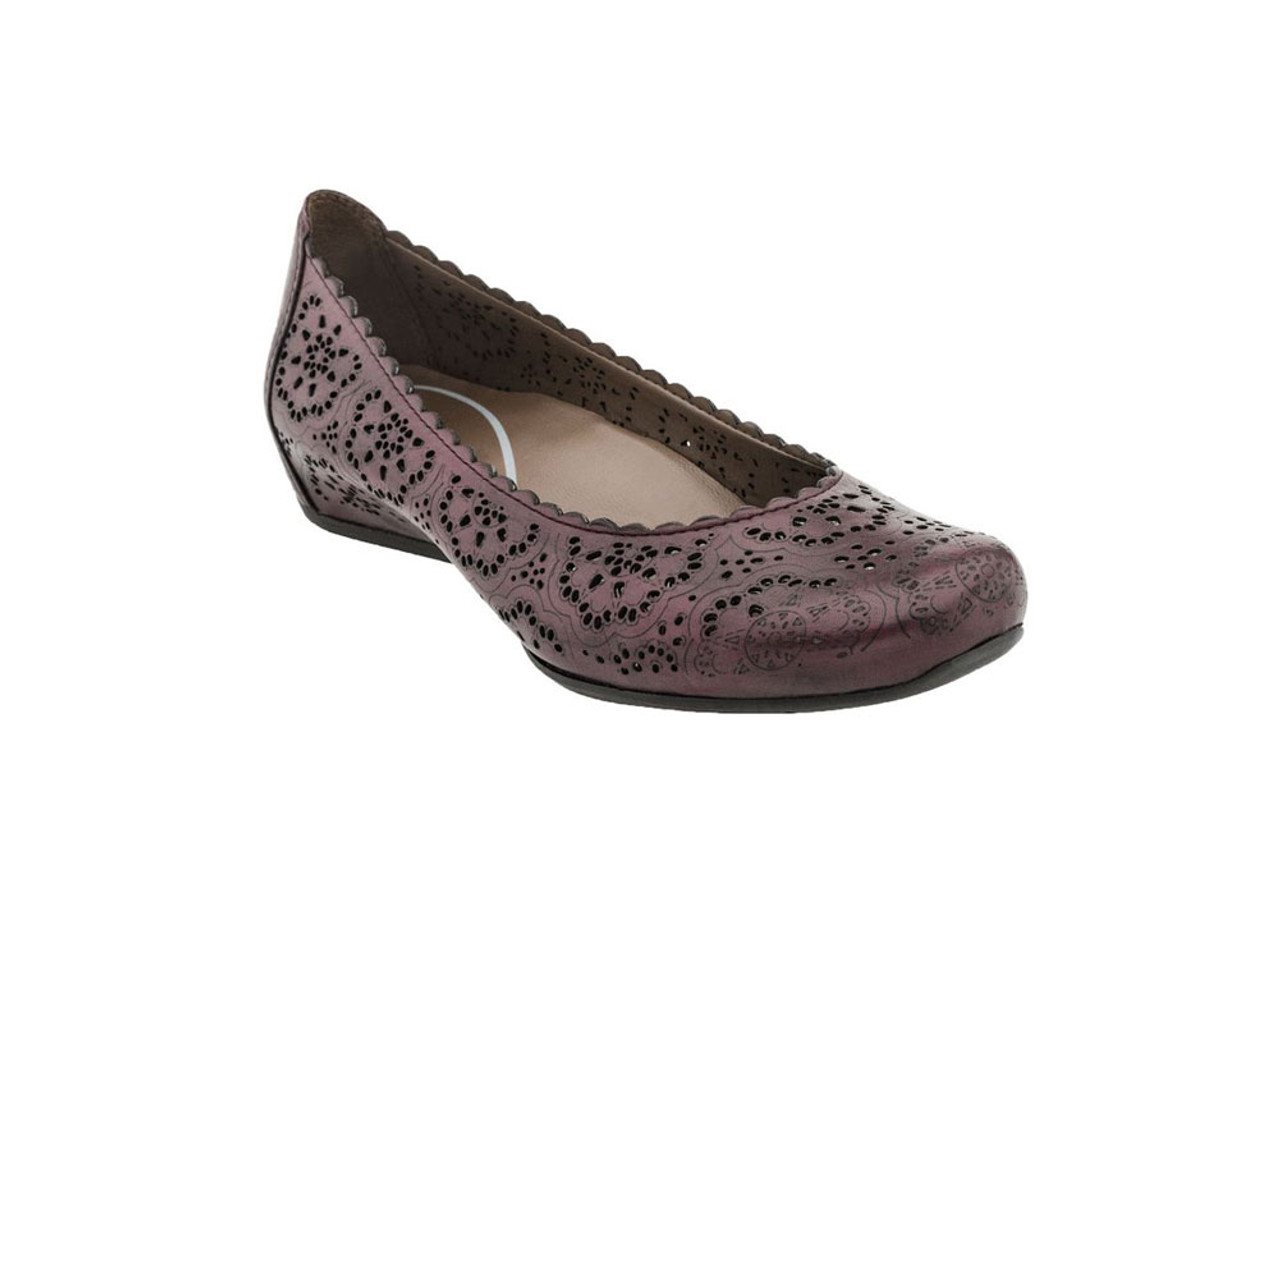 Earthies Women's Bindi Flat Wine Leather